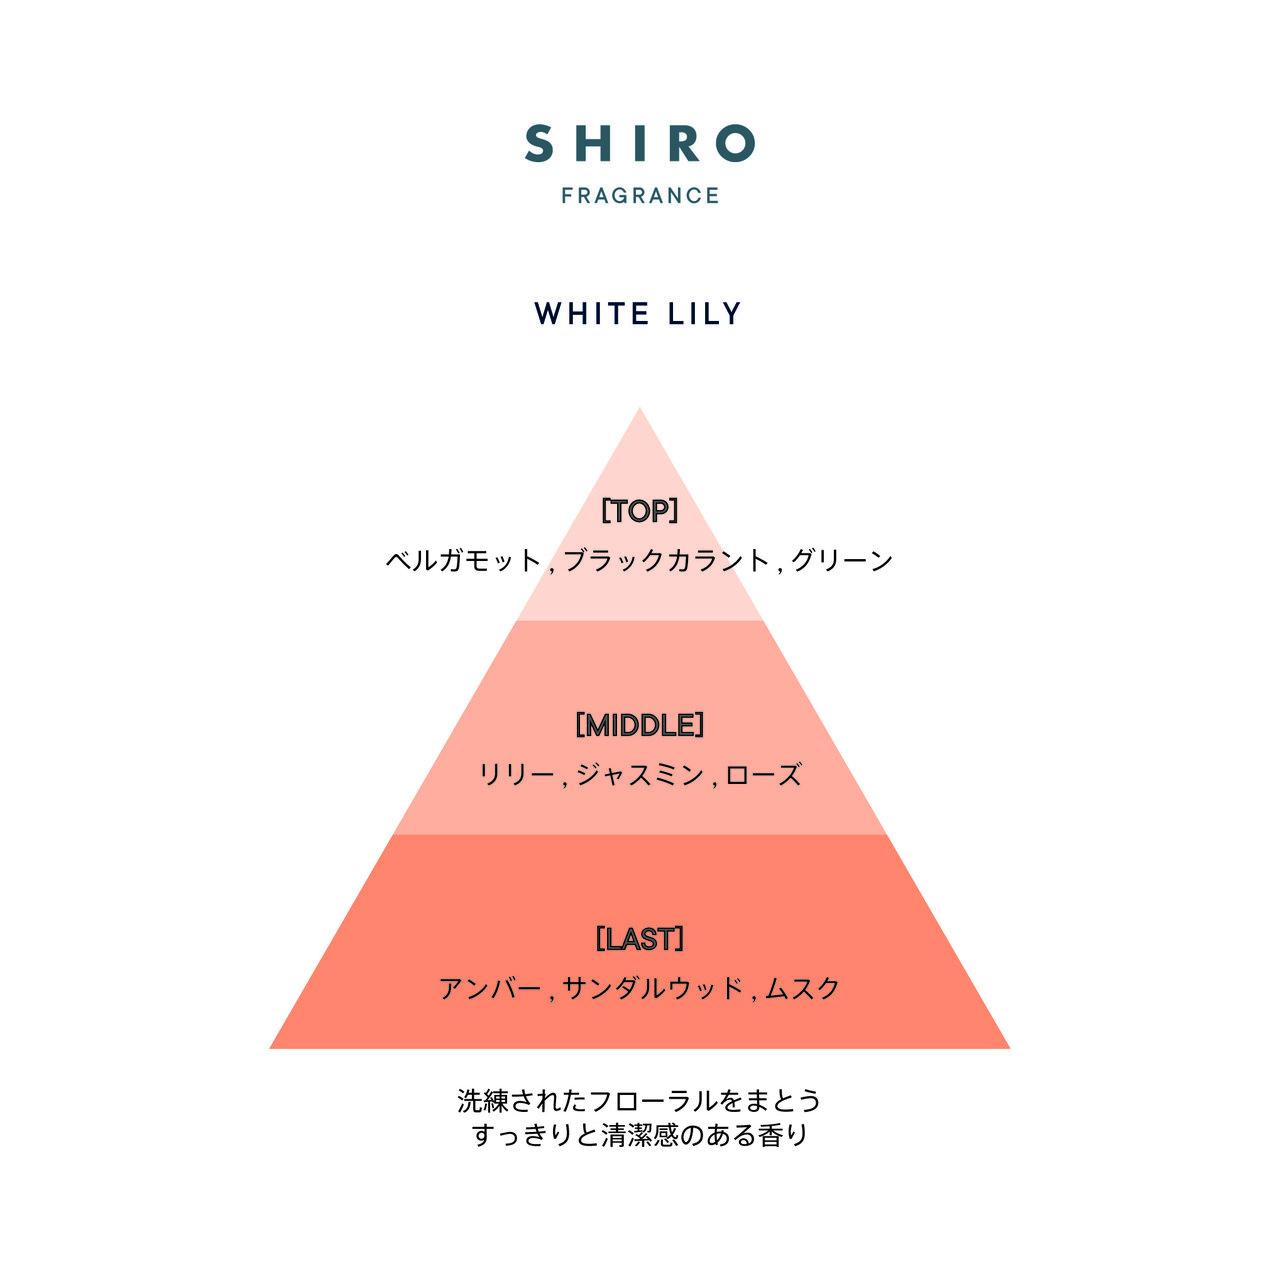 SHIRO FRAGRANCE SERIES「バスオイル」ホワイトリリー